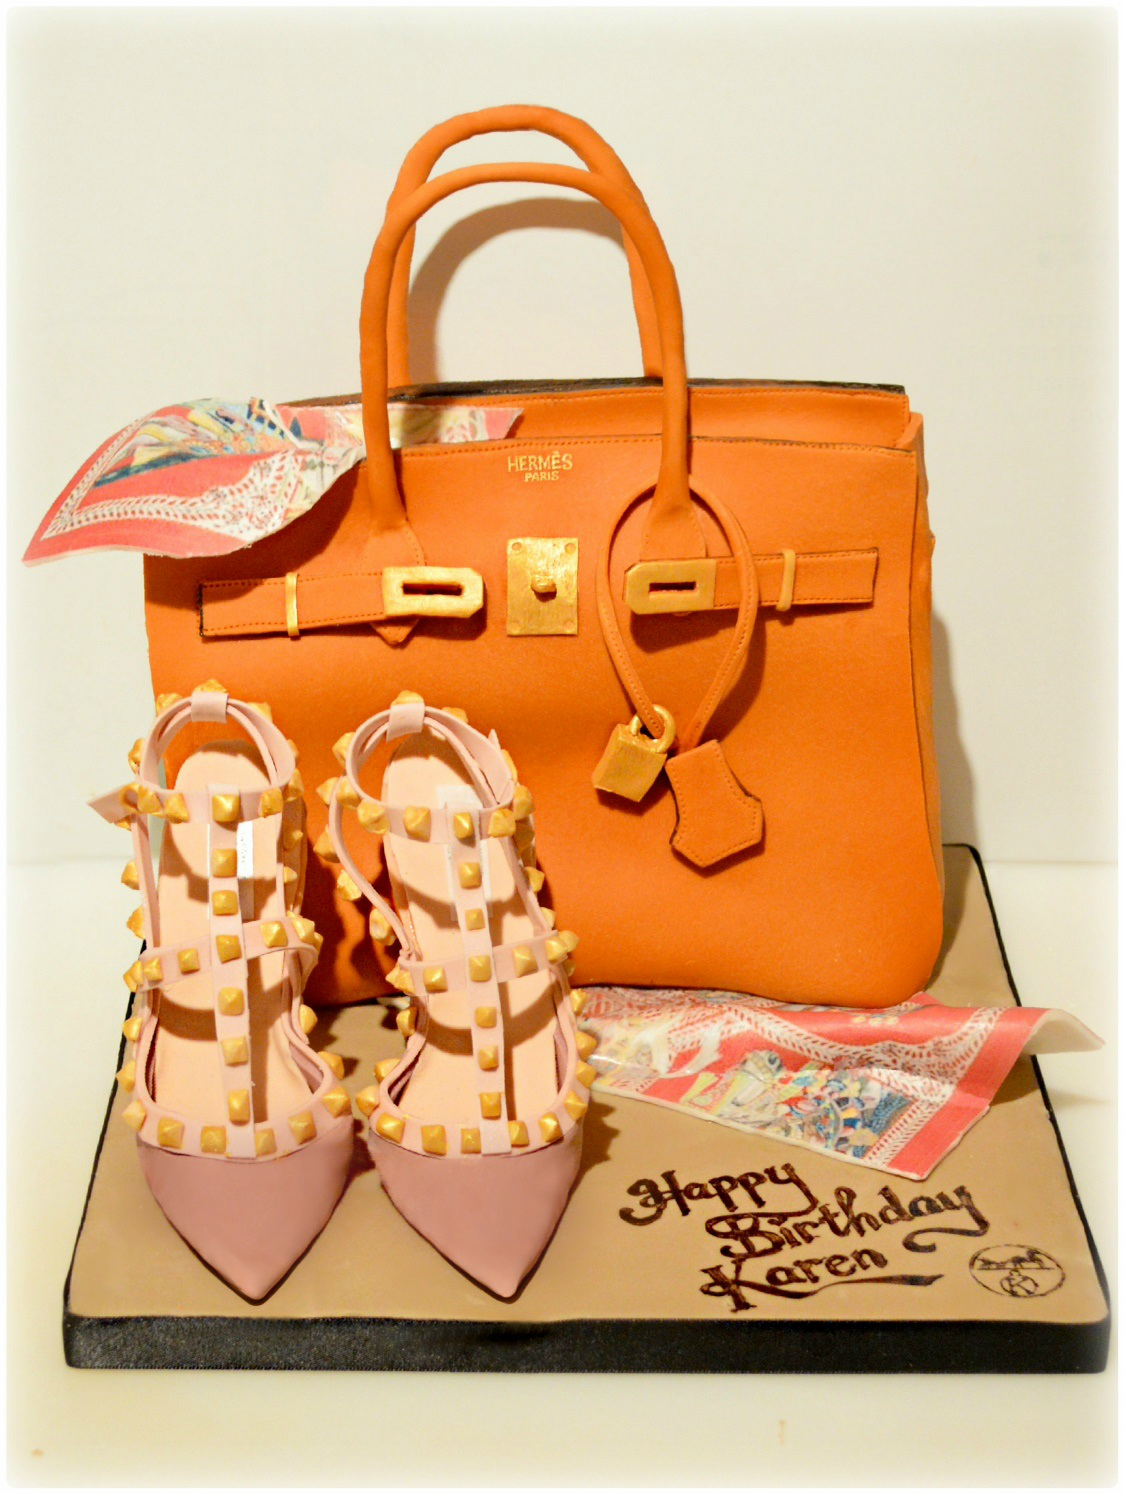 Hermes Orange Birkin Handbag Birthday Cake with Scarf and Valentino Rockstud Pumps High Heel Shoes